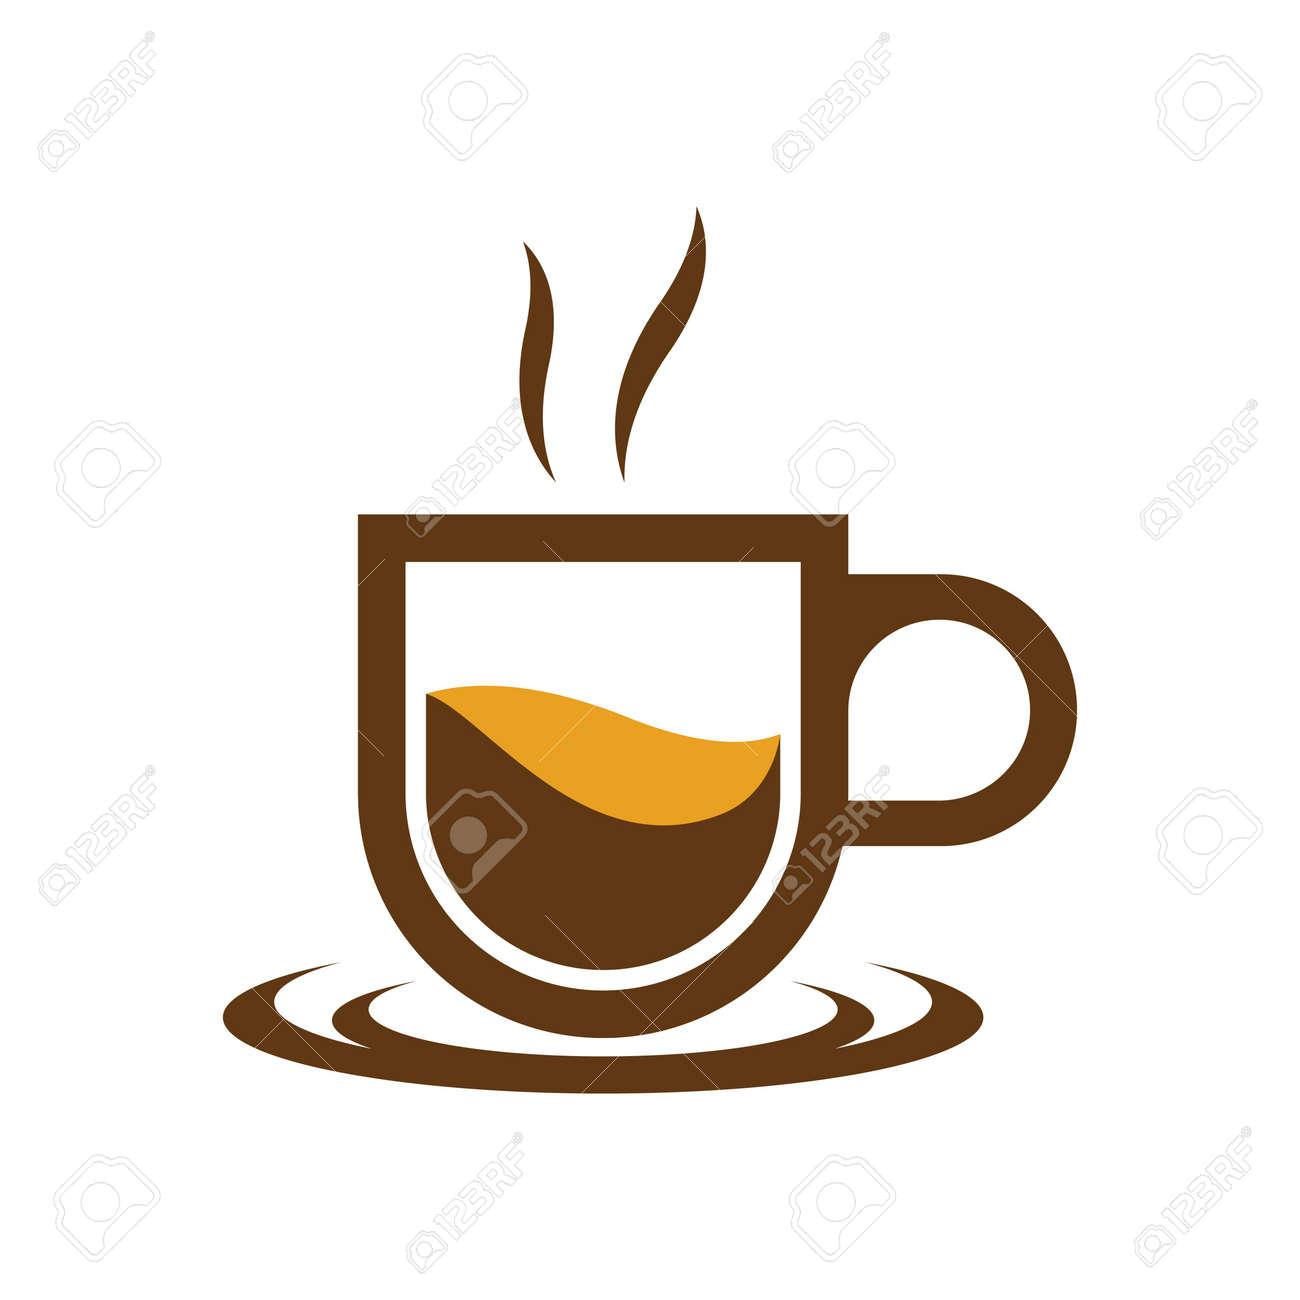 Coffee cup logo images illustration design - 167448790